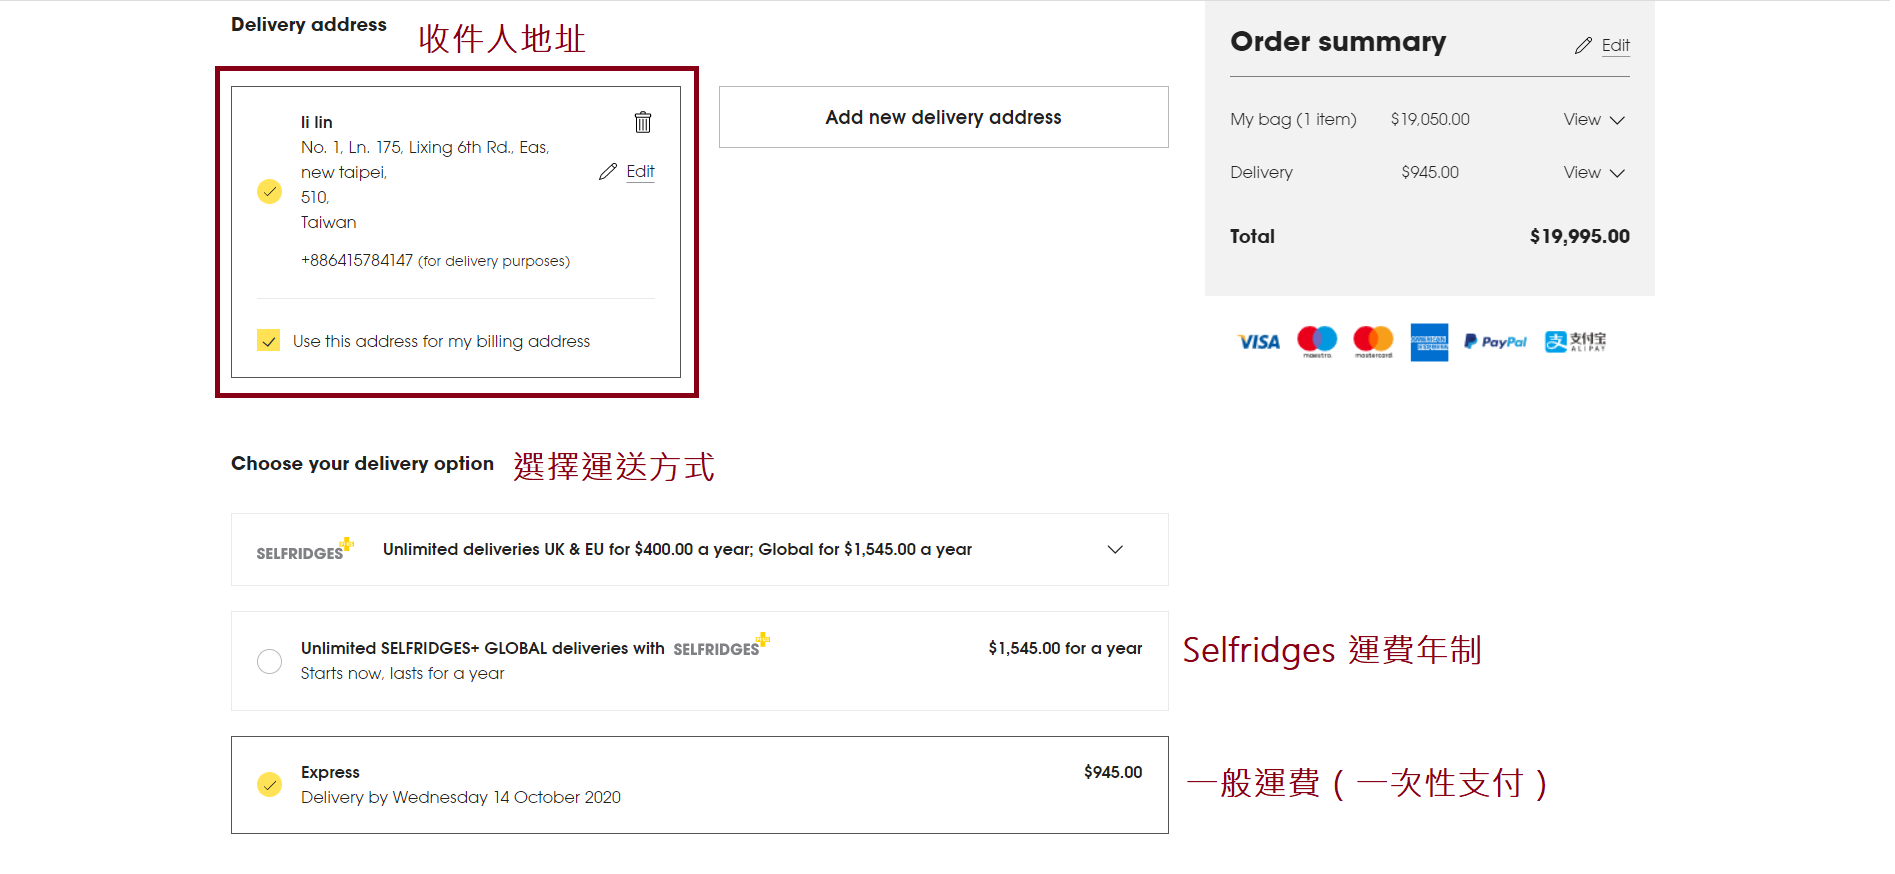 Selfridges & Co. 英國線上百貨購買教學-選擇配送方式